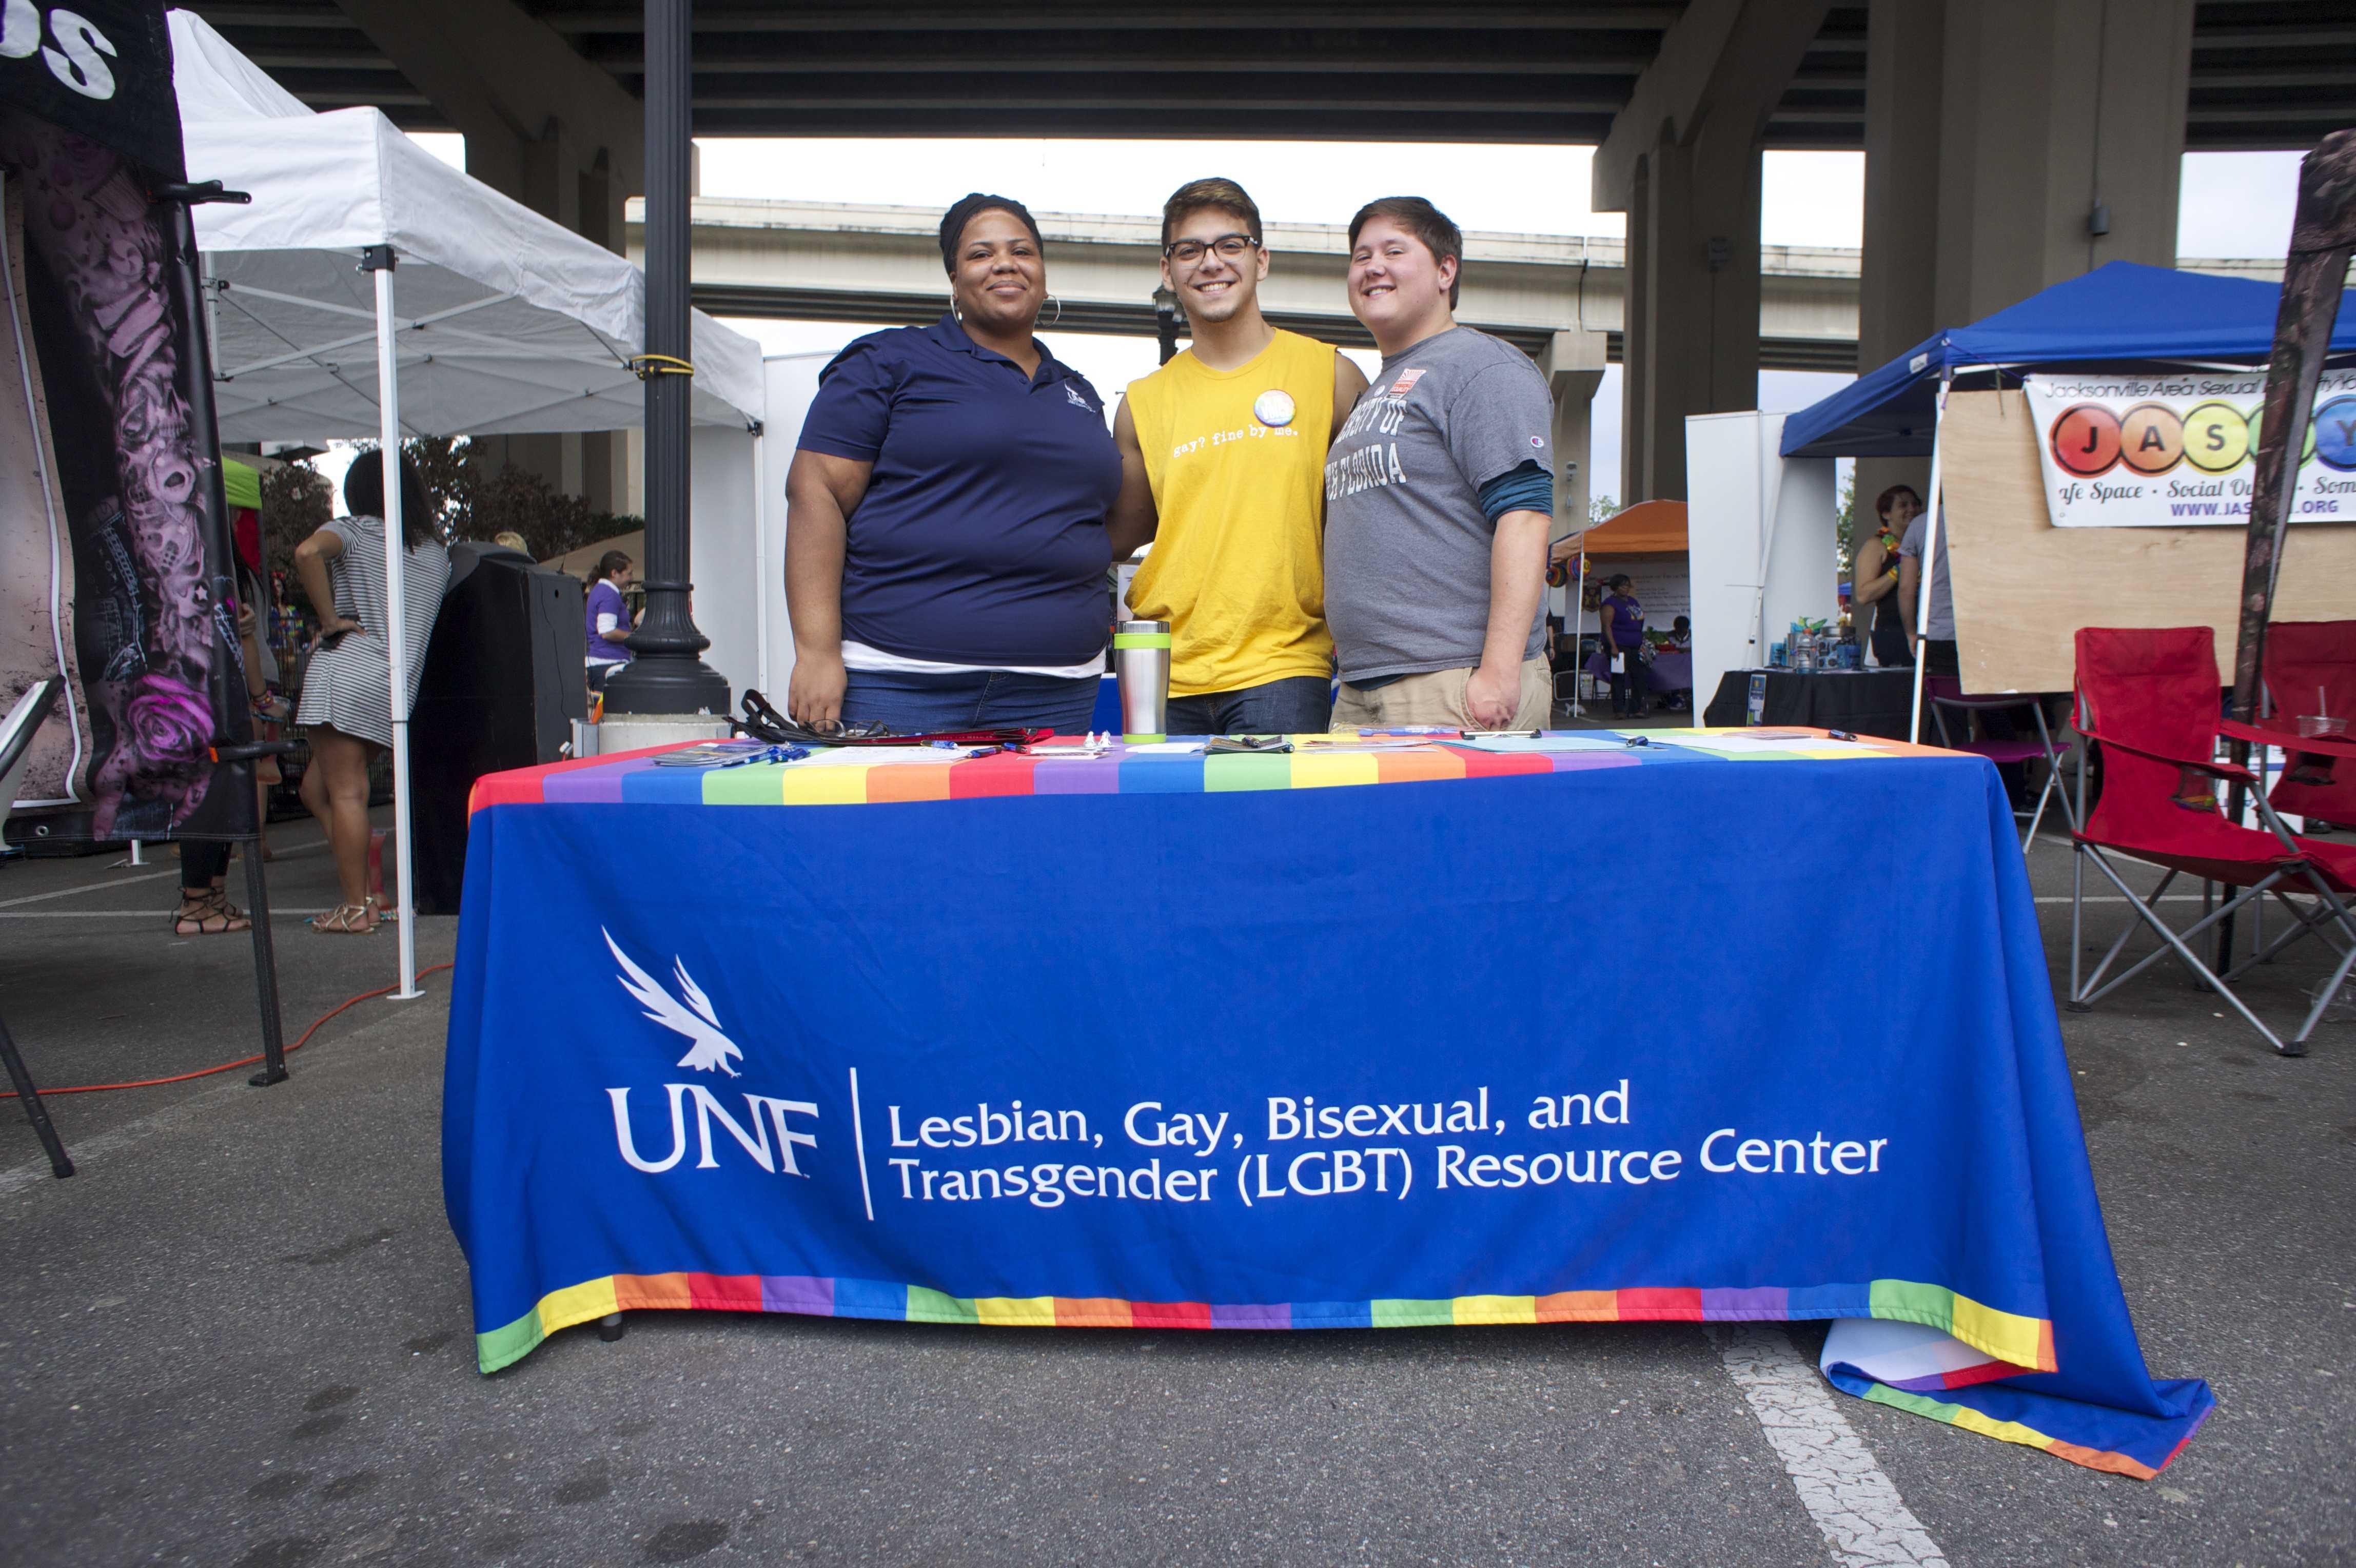 LGBT Center represents UNF at River City Pride Festival